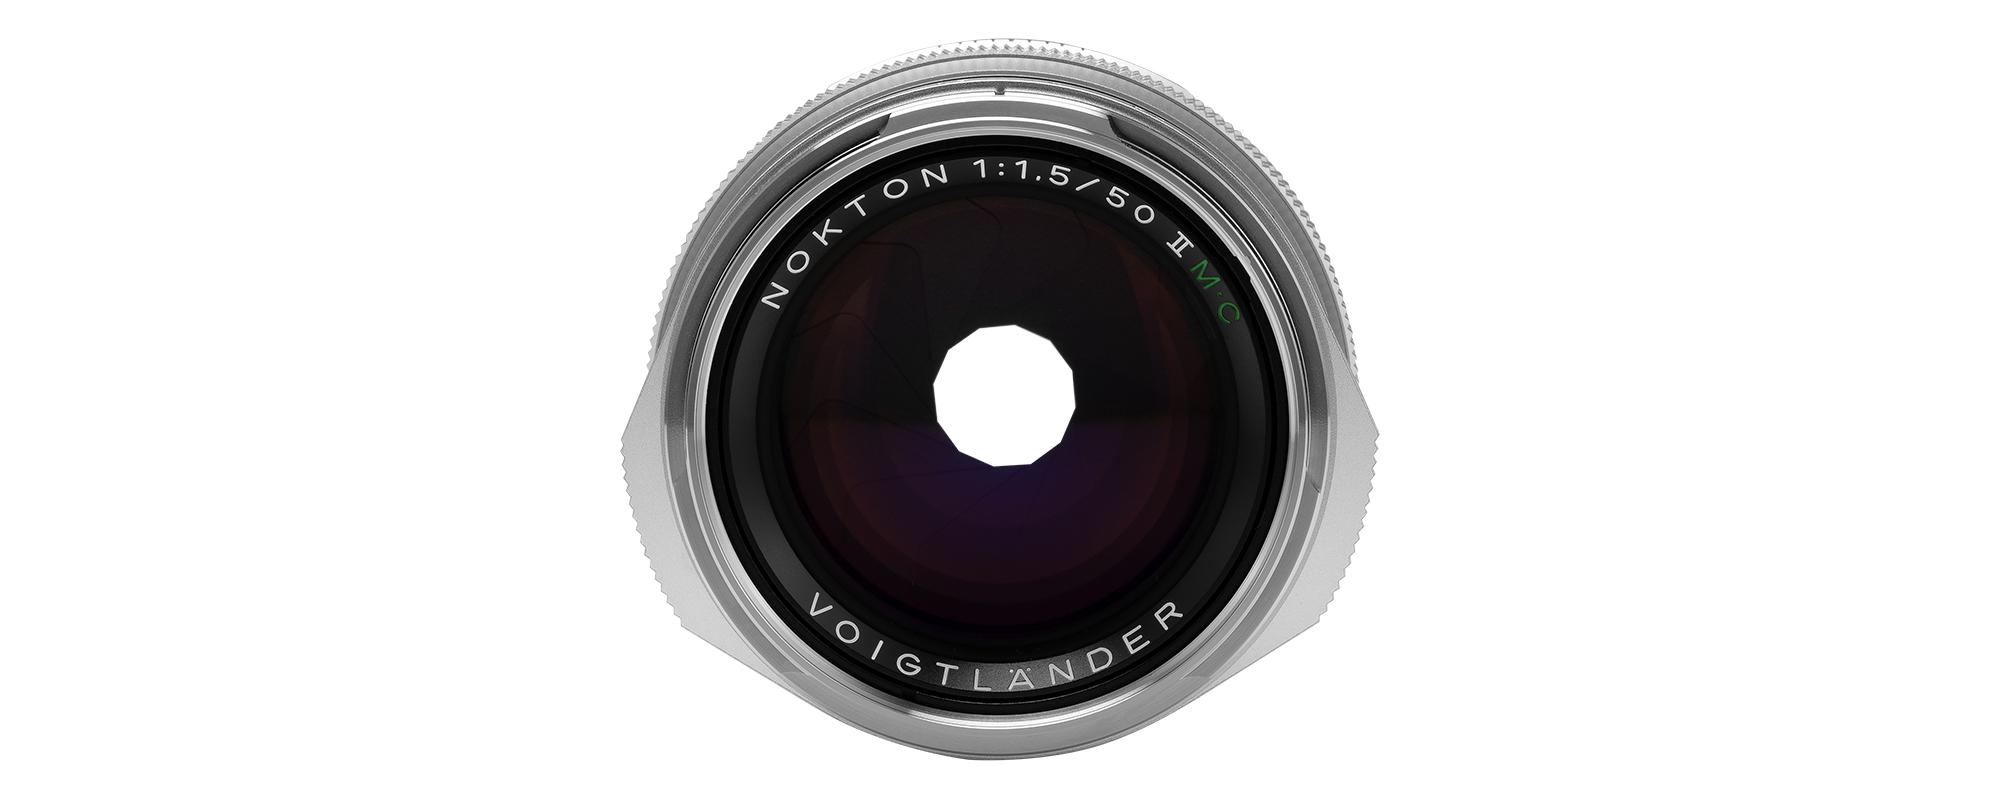 Voigtlander Nokton II 50 mm f/1.5 lens for Leica M - MC, silver